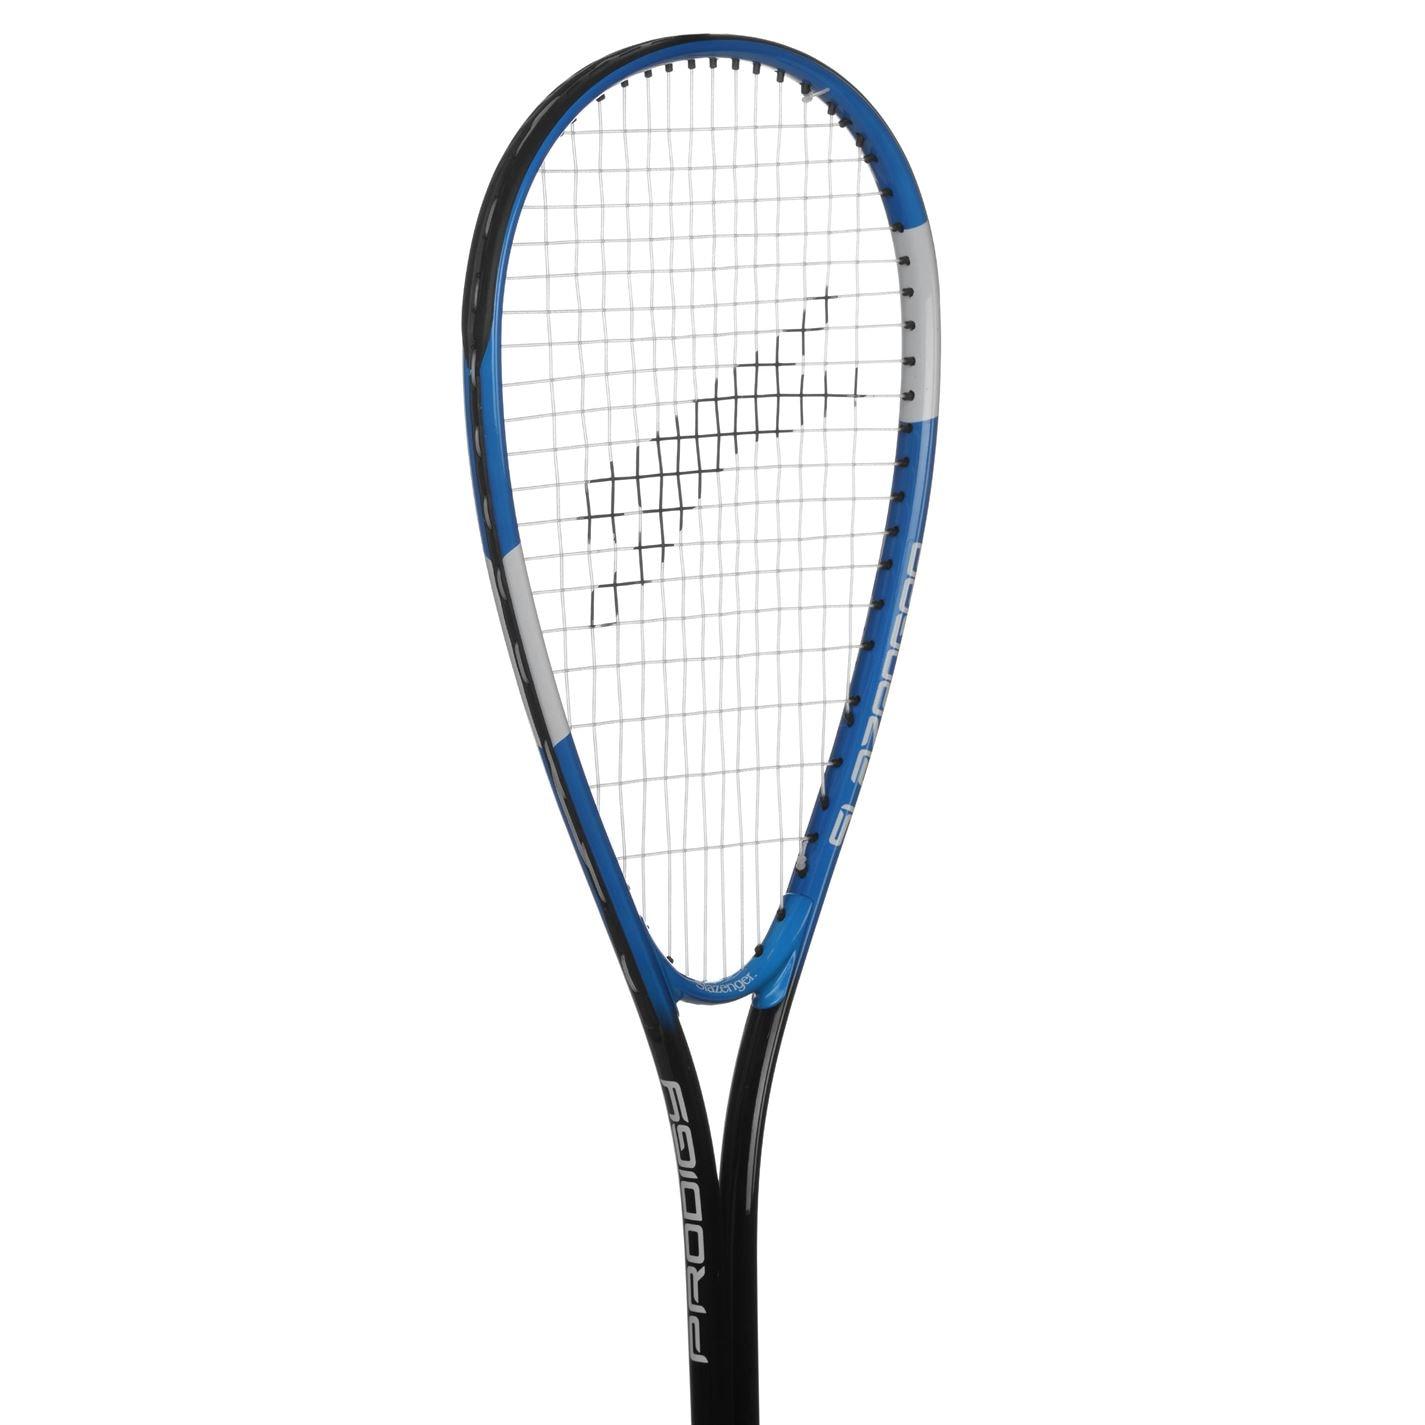 Slazenger Prodigy Squash Racket Blue/White